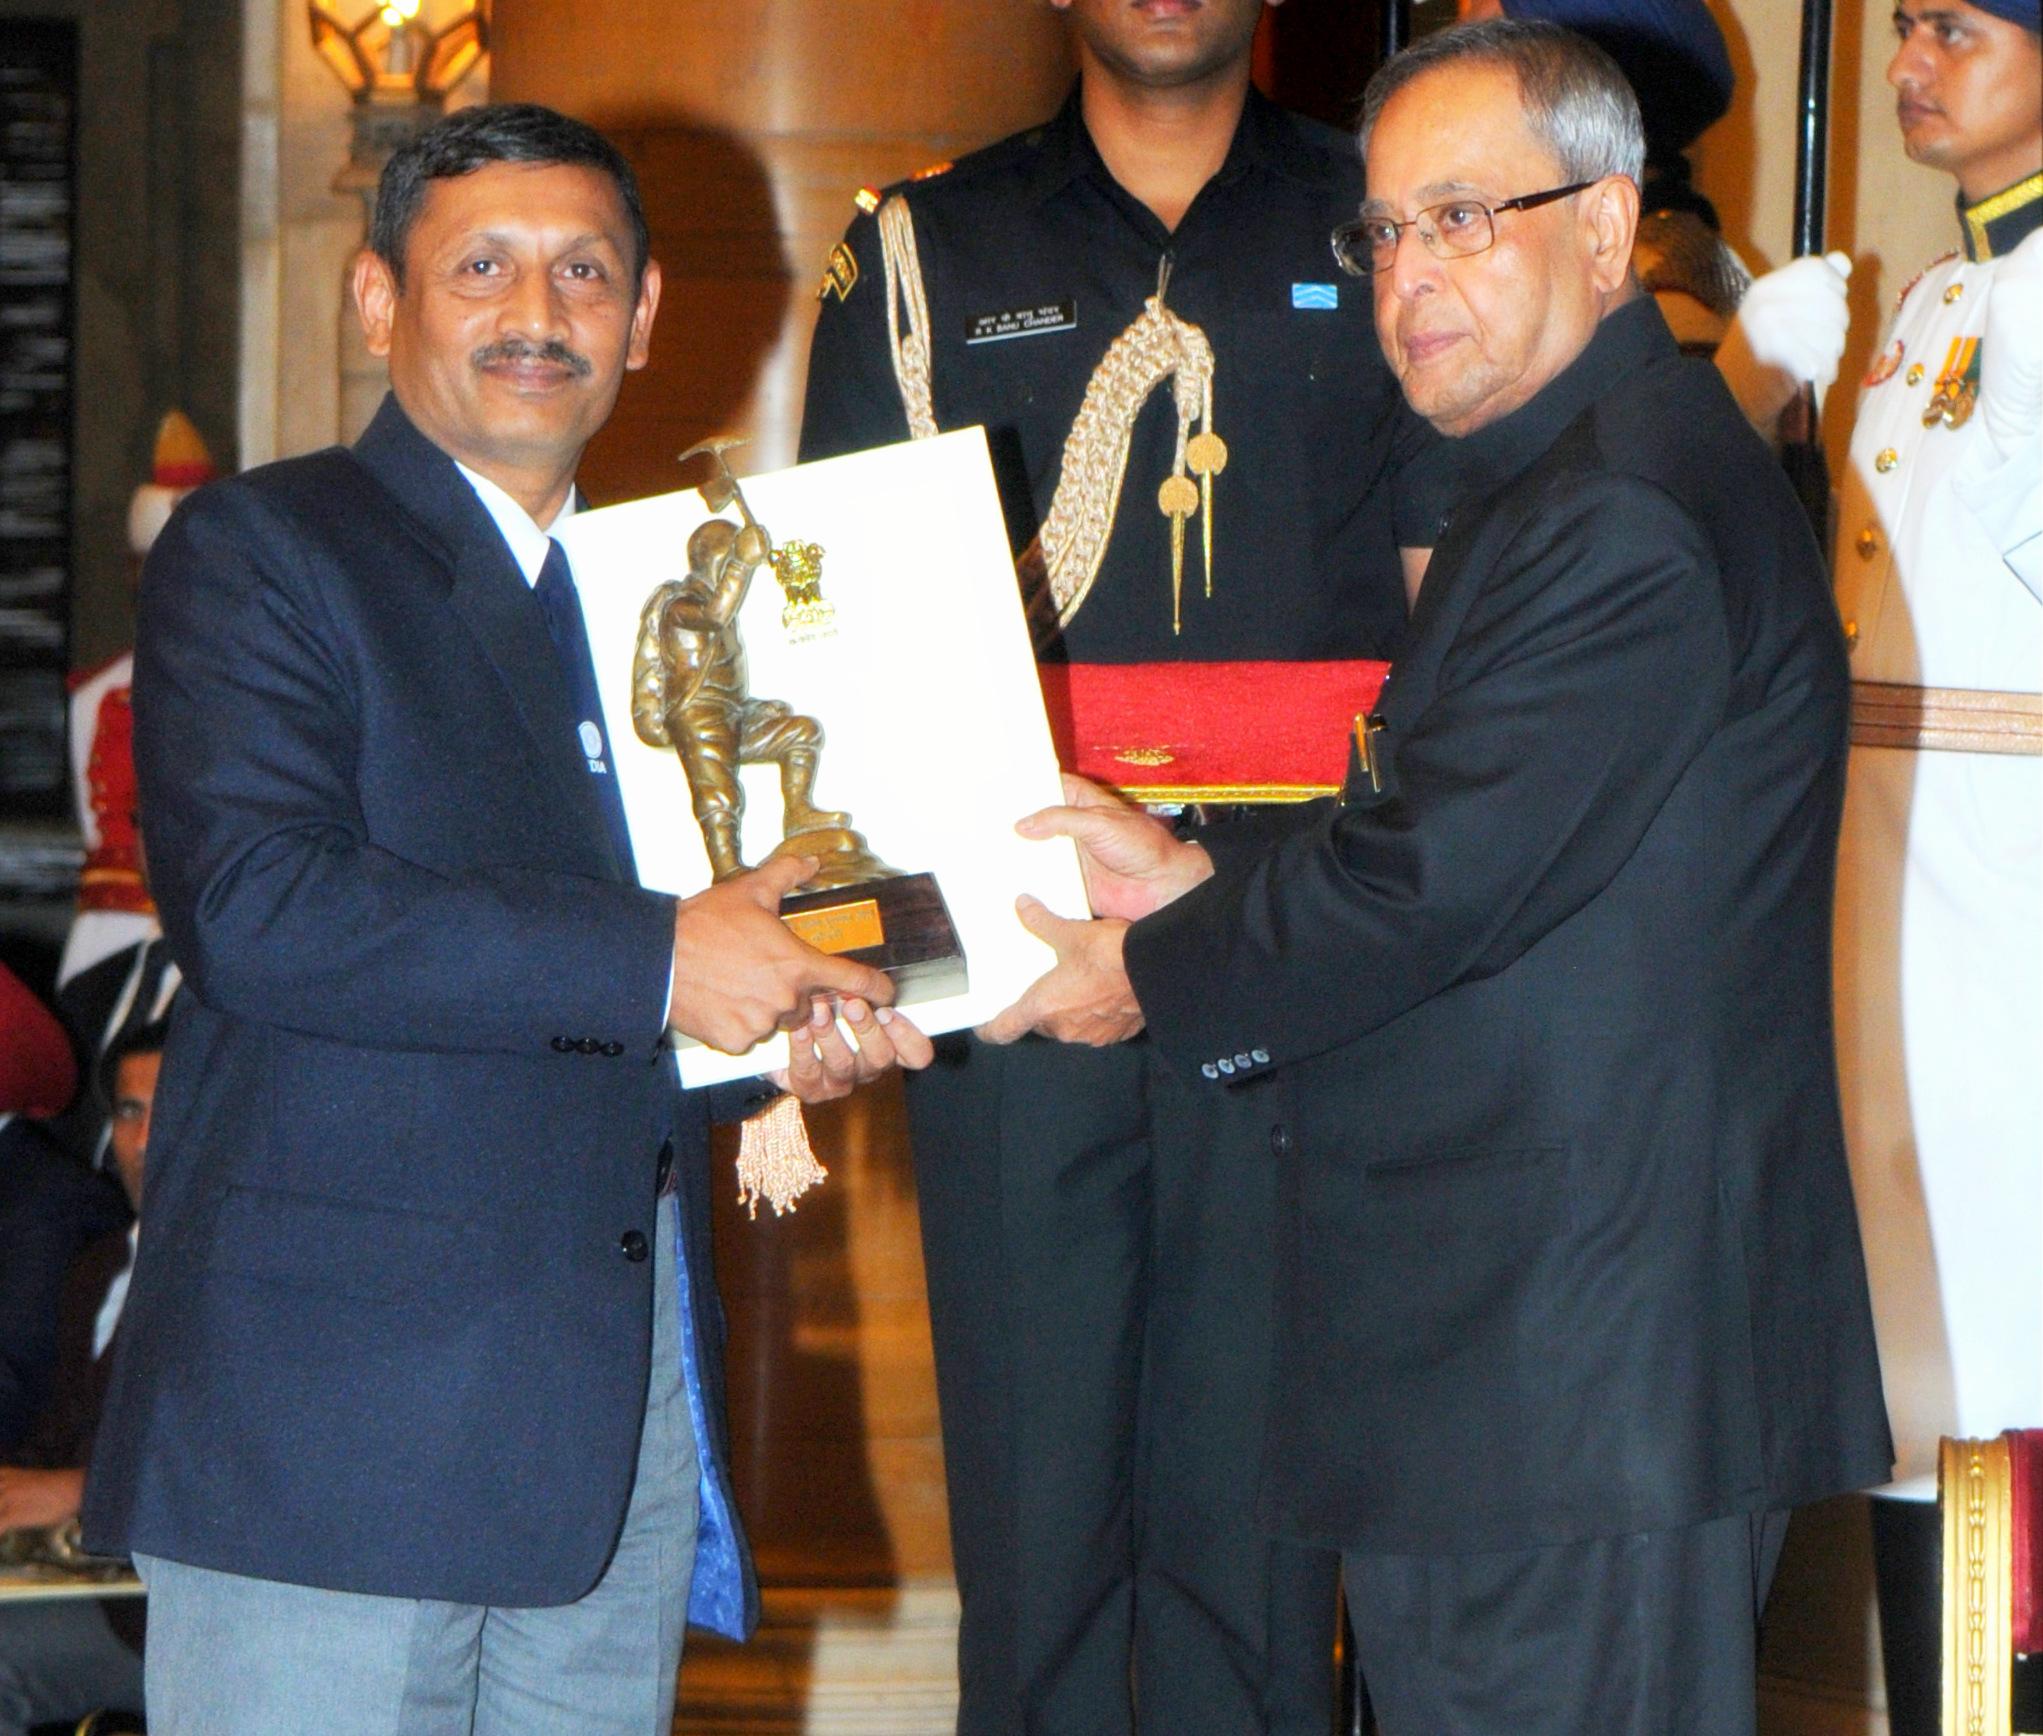 The President, Shri Pranab Mukherjee presenting the Tenzing Norgay National Adventure Award for the year-2013 to Wg. Cdr.(Retd.) Amit Chowdhury for Lifetime Achievement, in a glittering ceremony, at Rashtrapati Bhavan